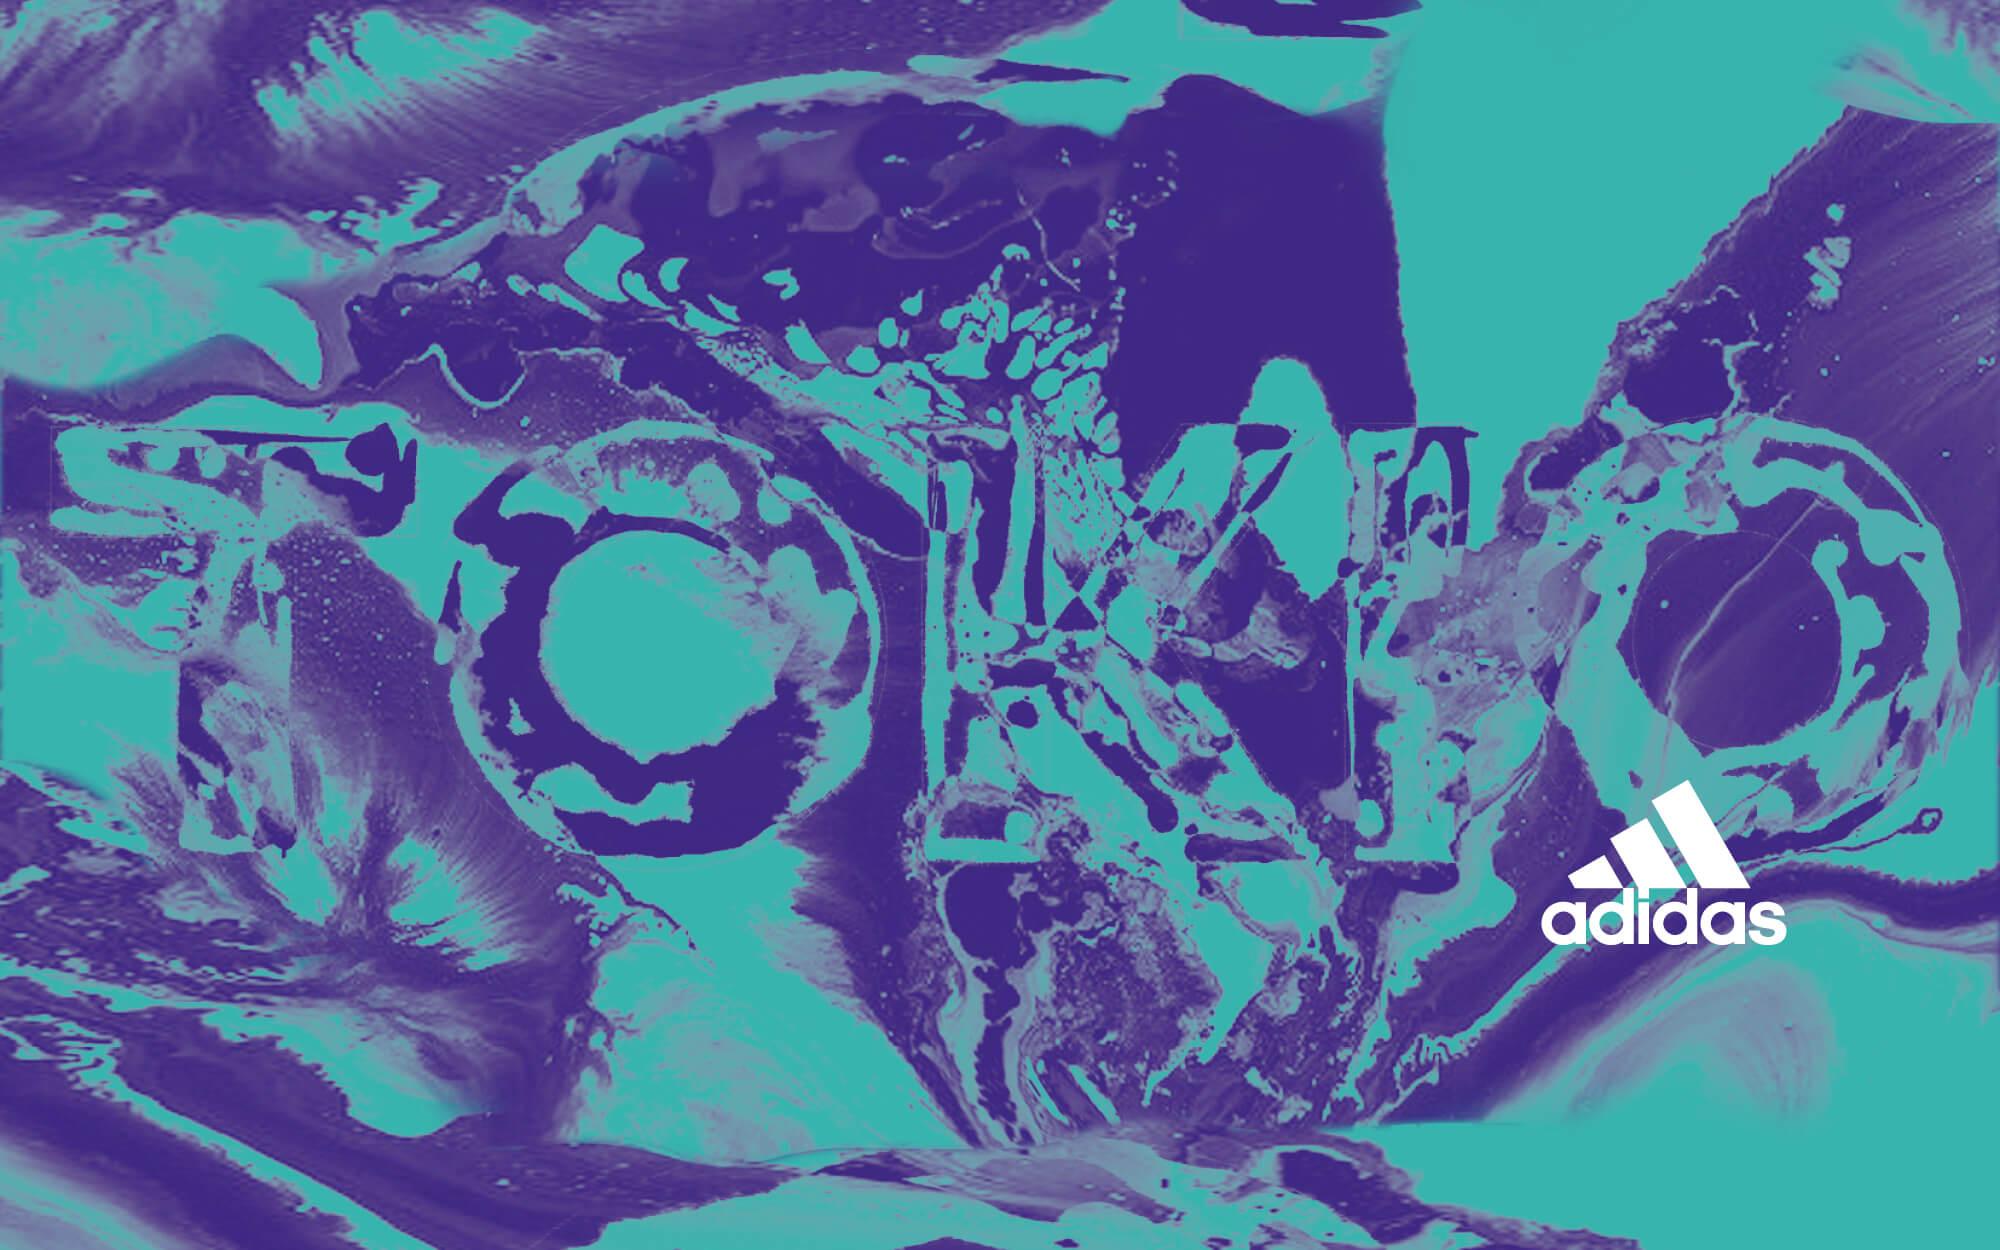 EIGA_adidas_TypeExploration_L_07